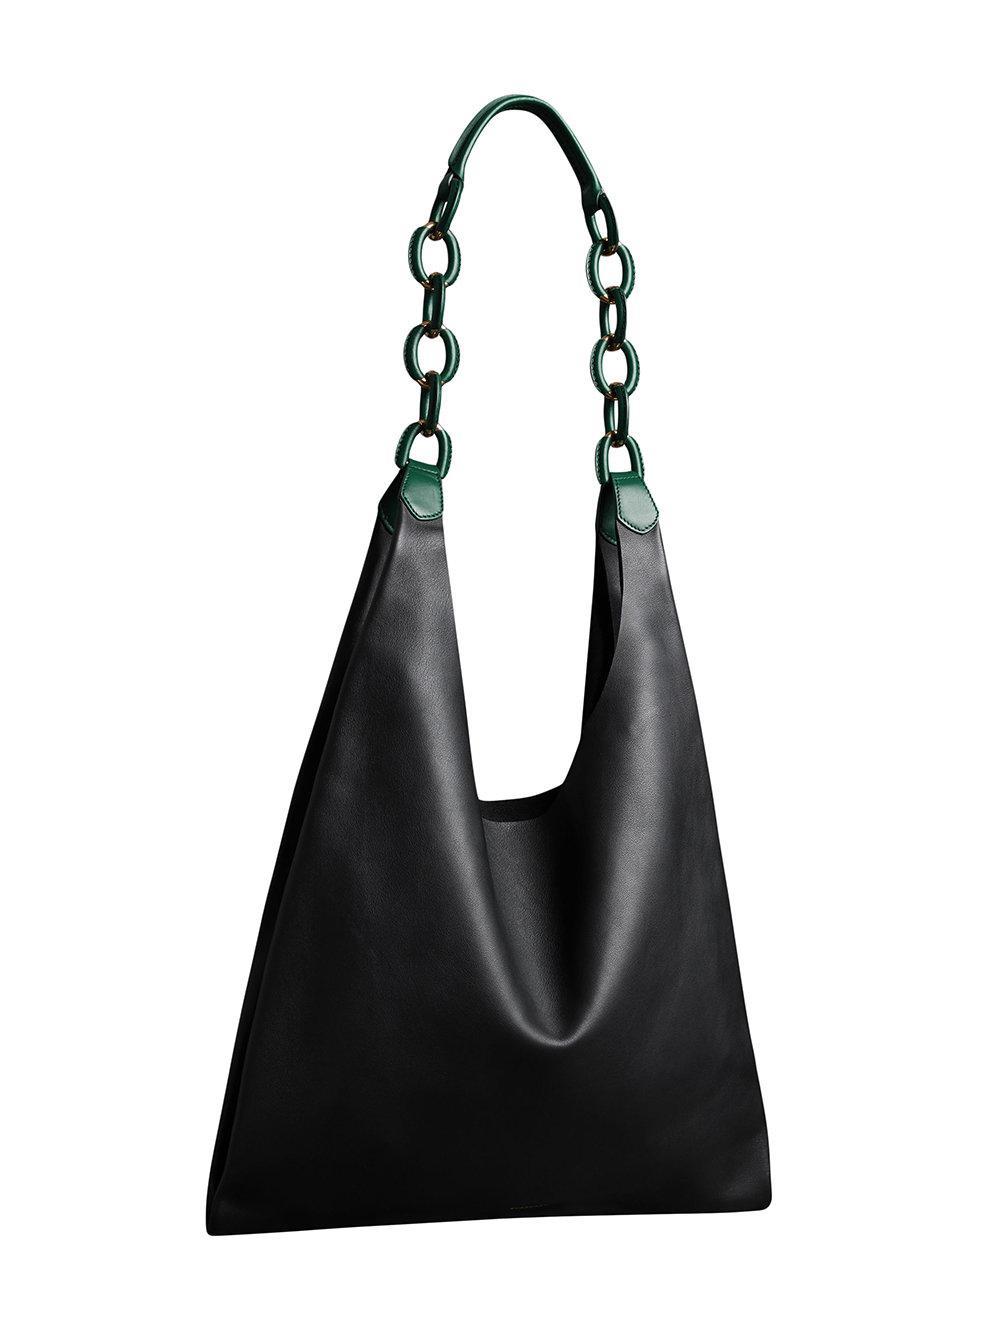 Burberry - Black Medium Two-tone Leather Shopper - Lyst. View fullscreen 30cc0fb9fc515